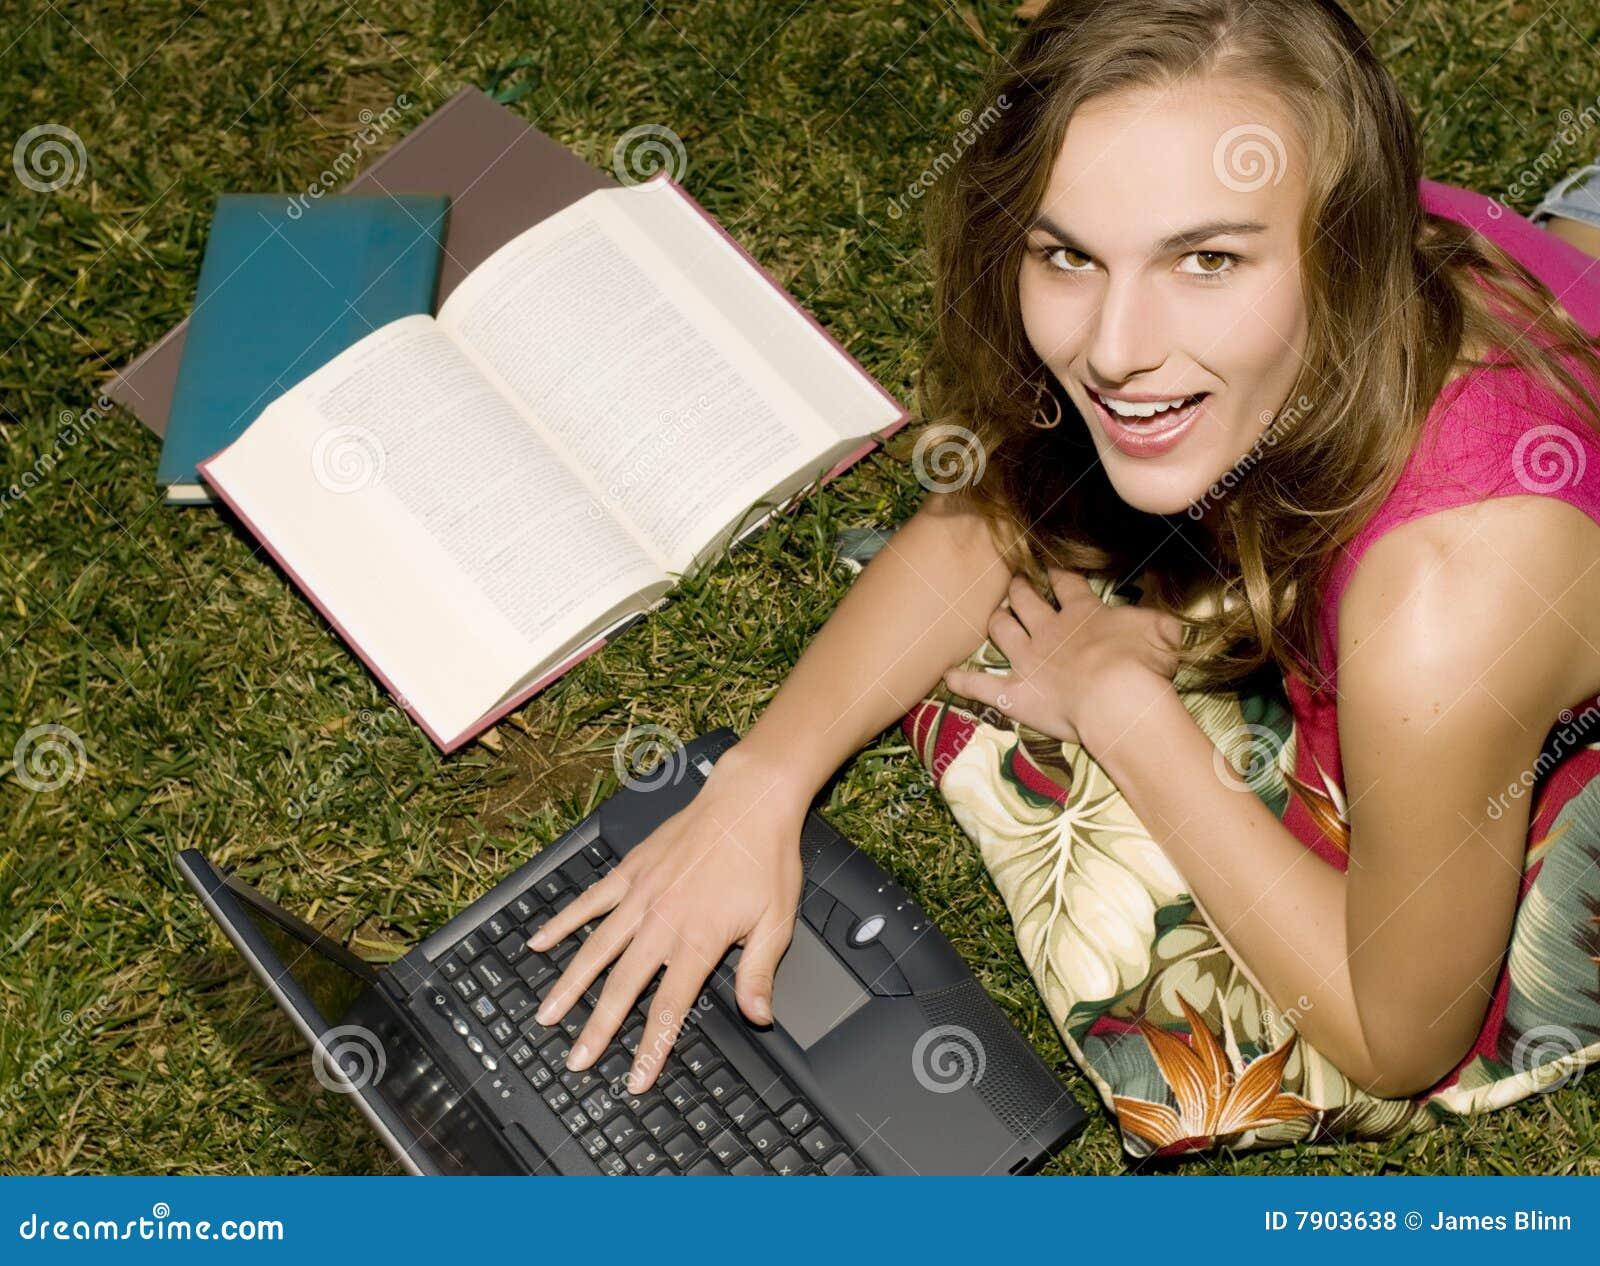 Research paper by soumyajit das on green marketing